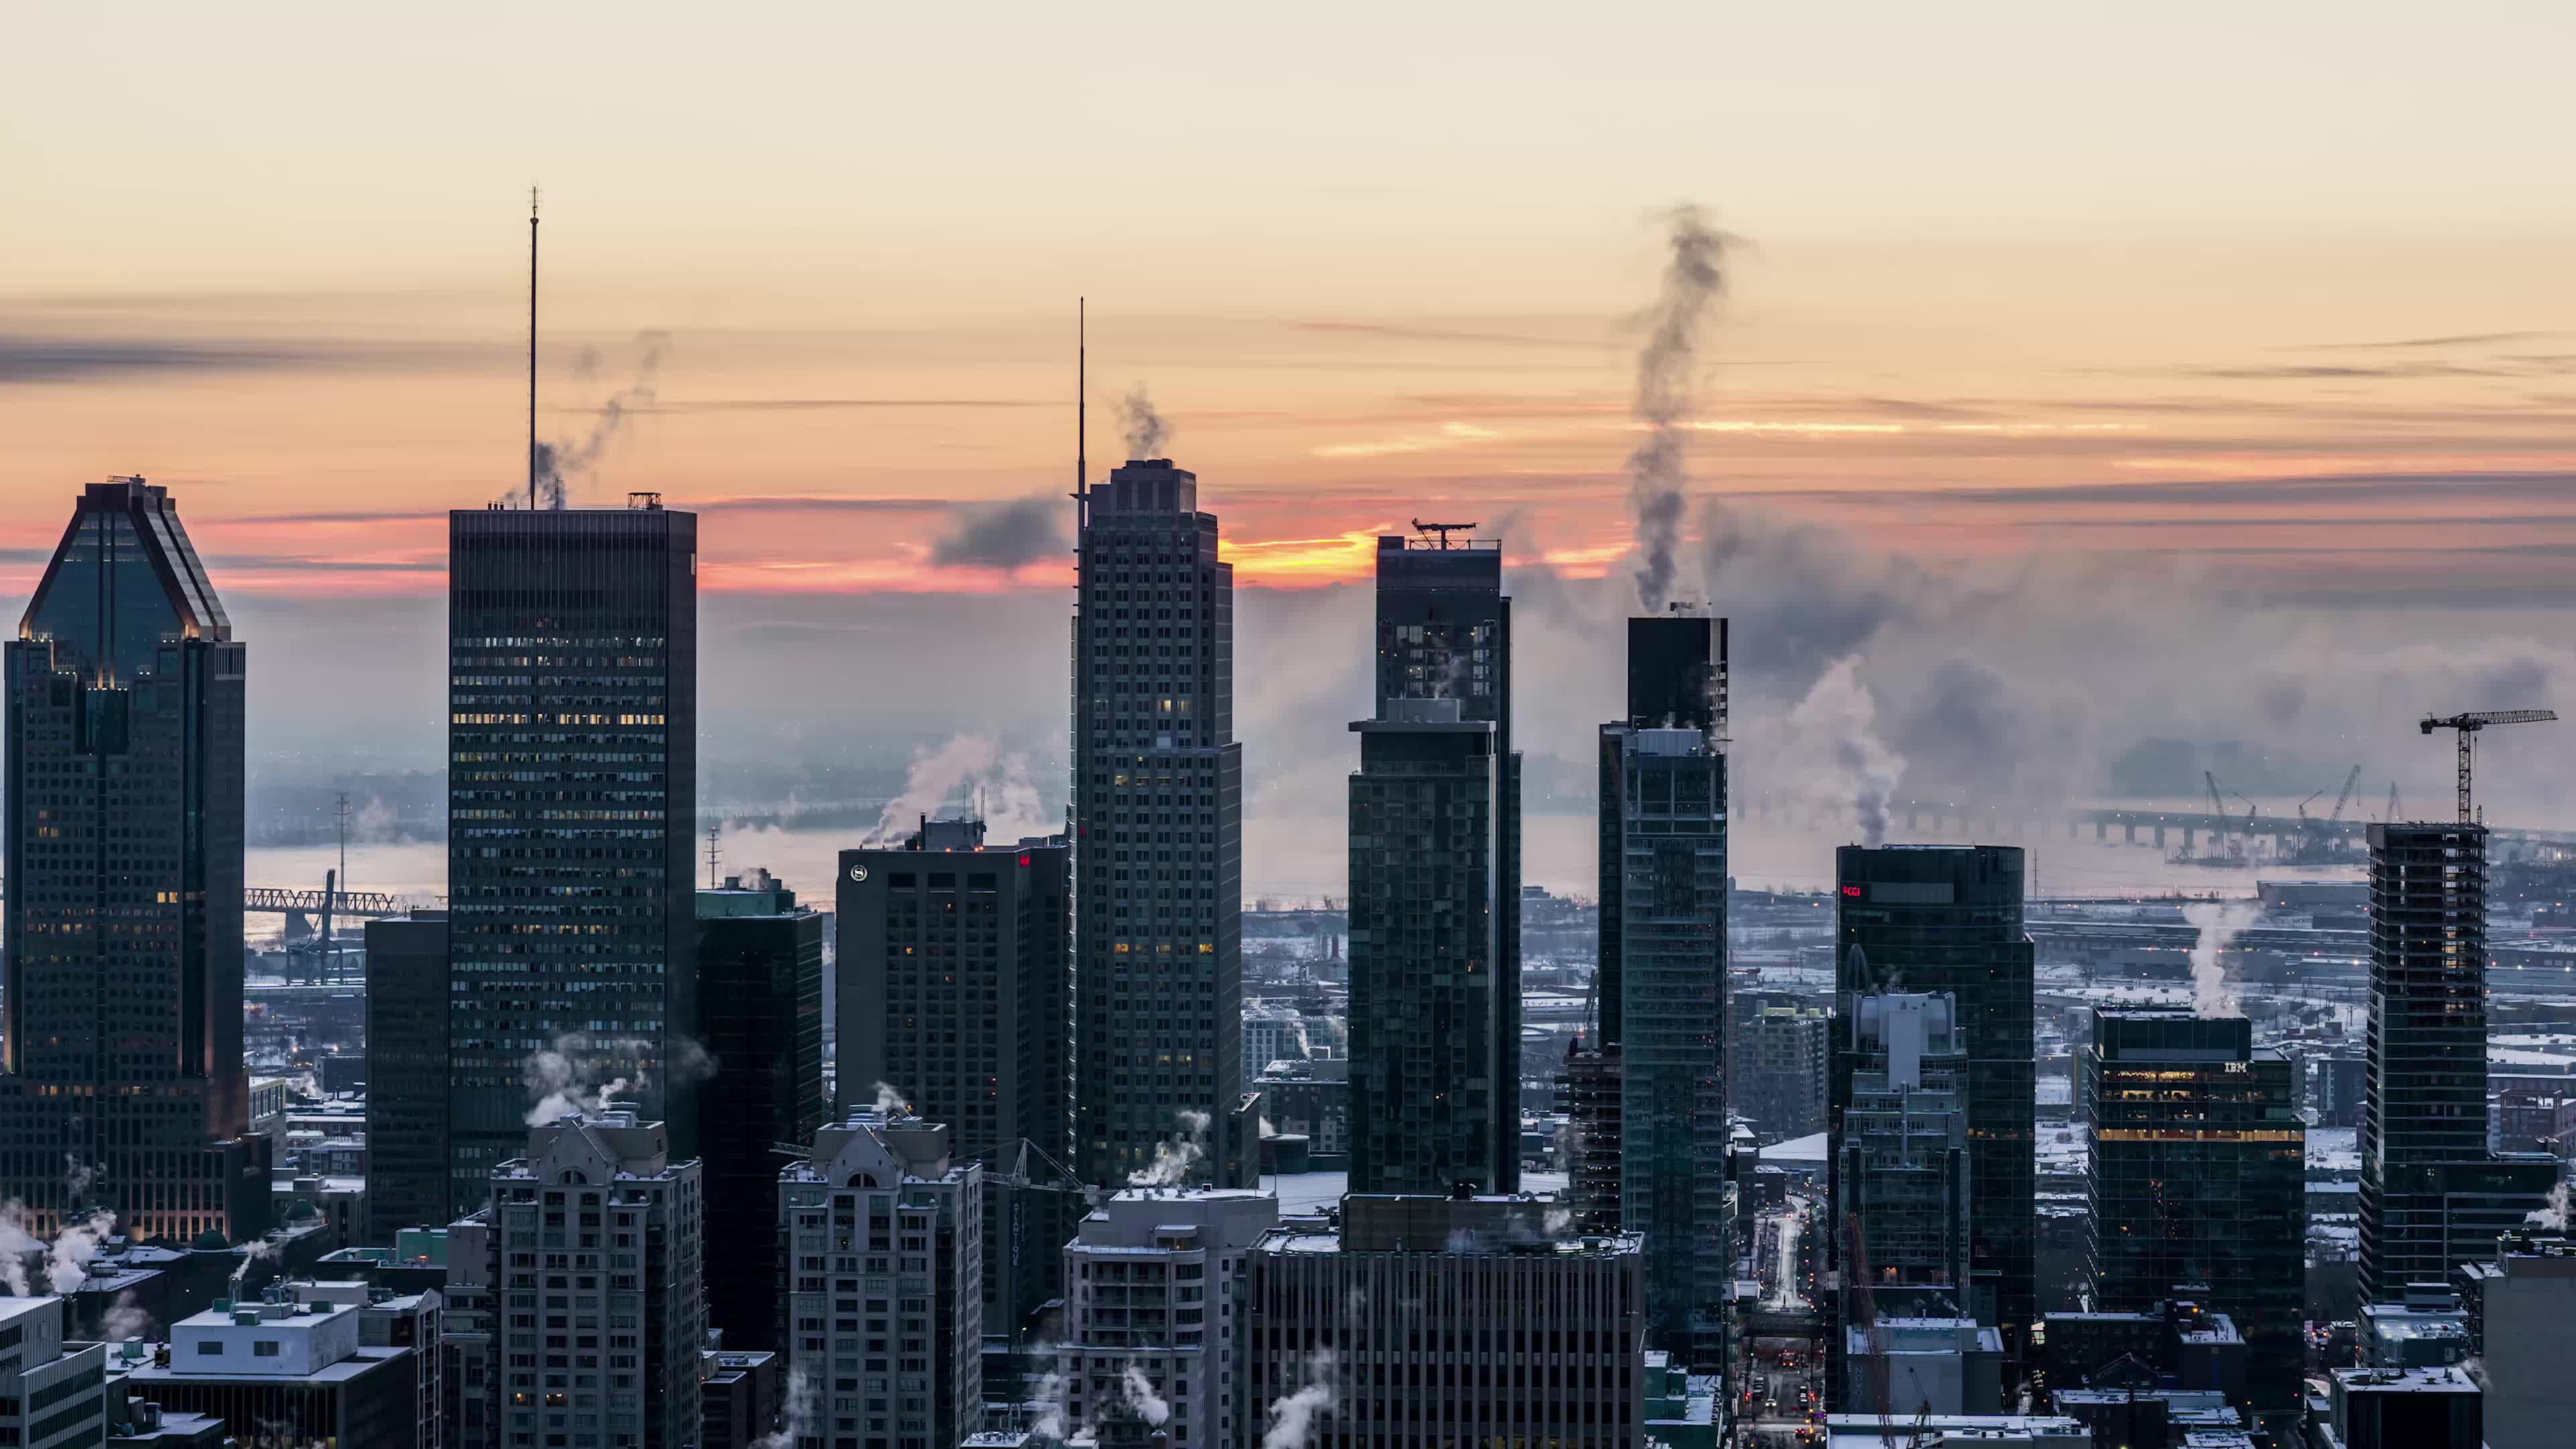 montreal, sunrise, Montreal Winter Sunrise Timelapse GIFs